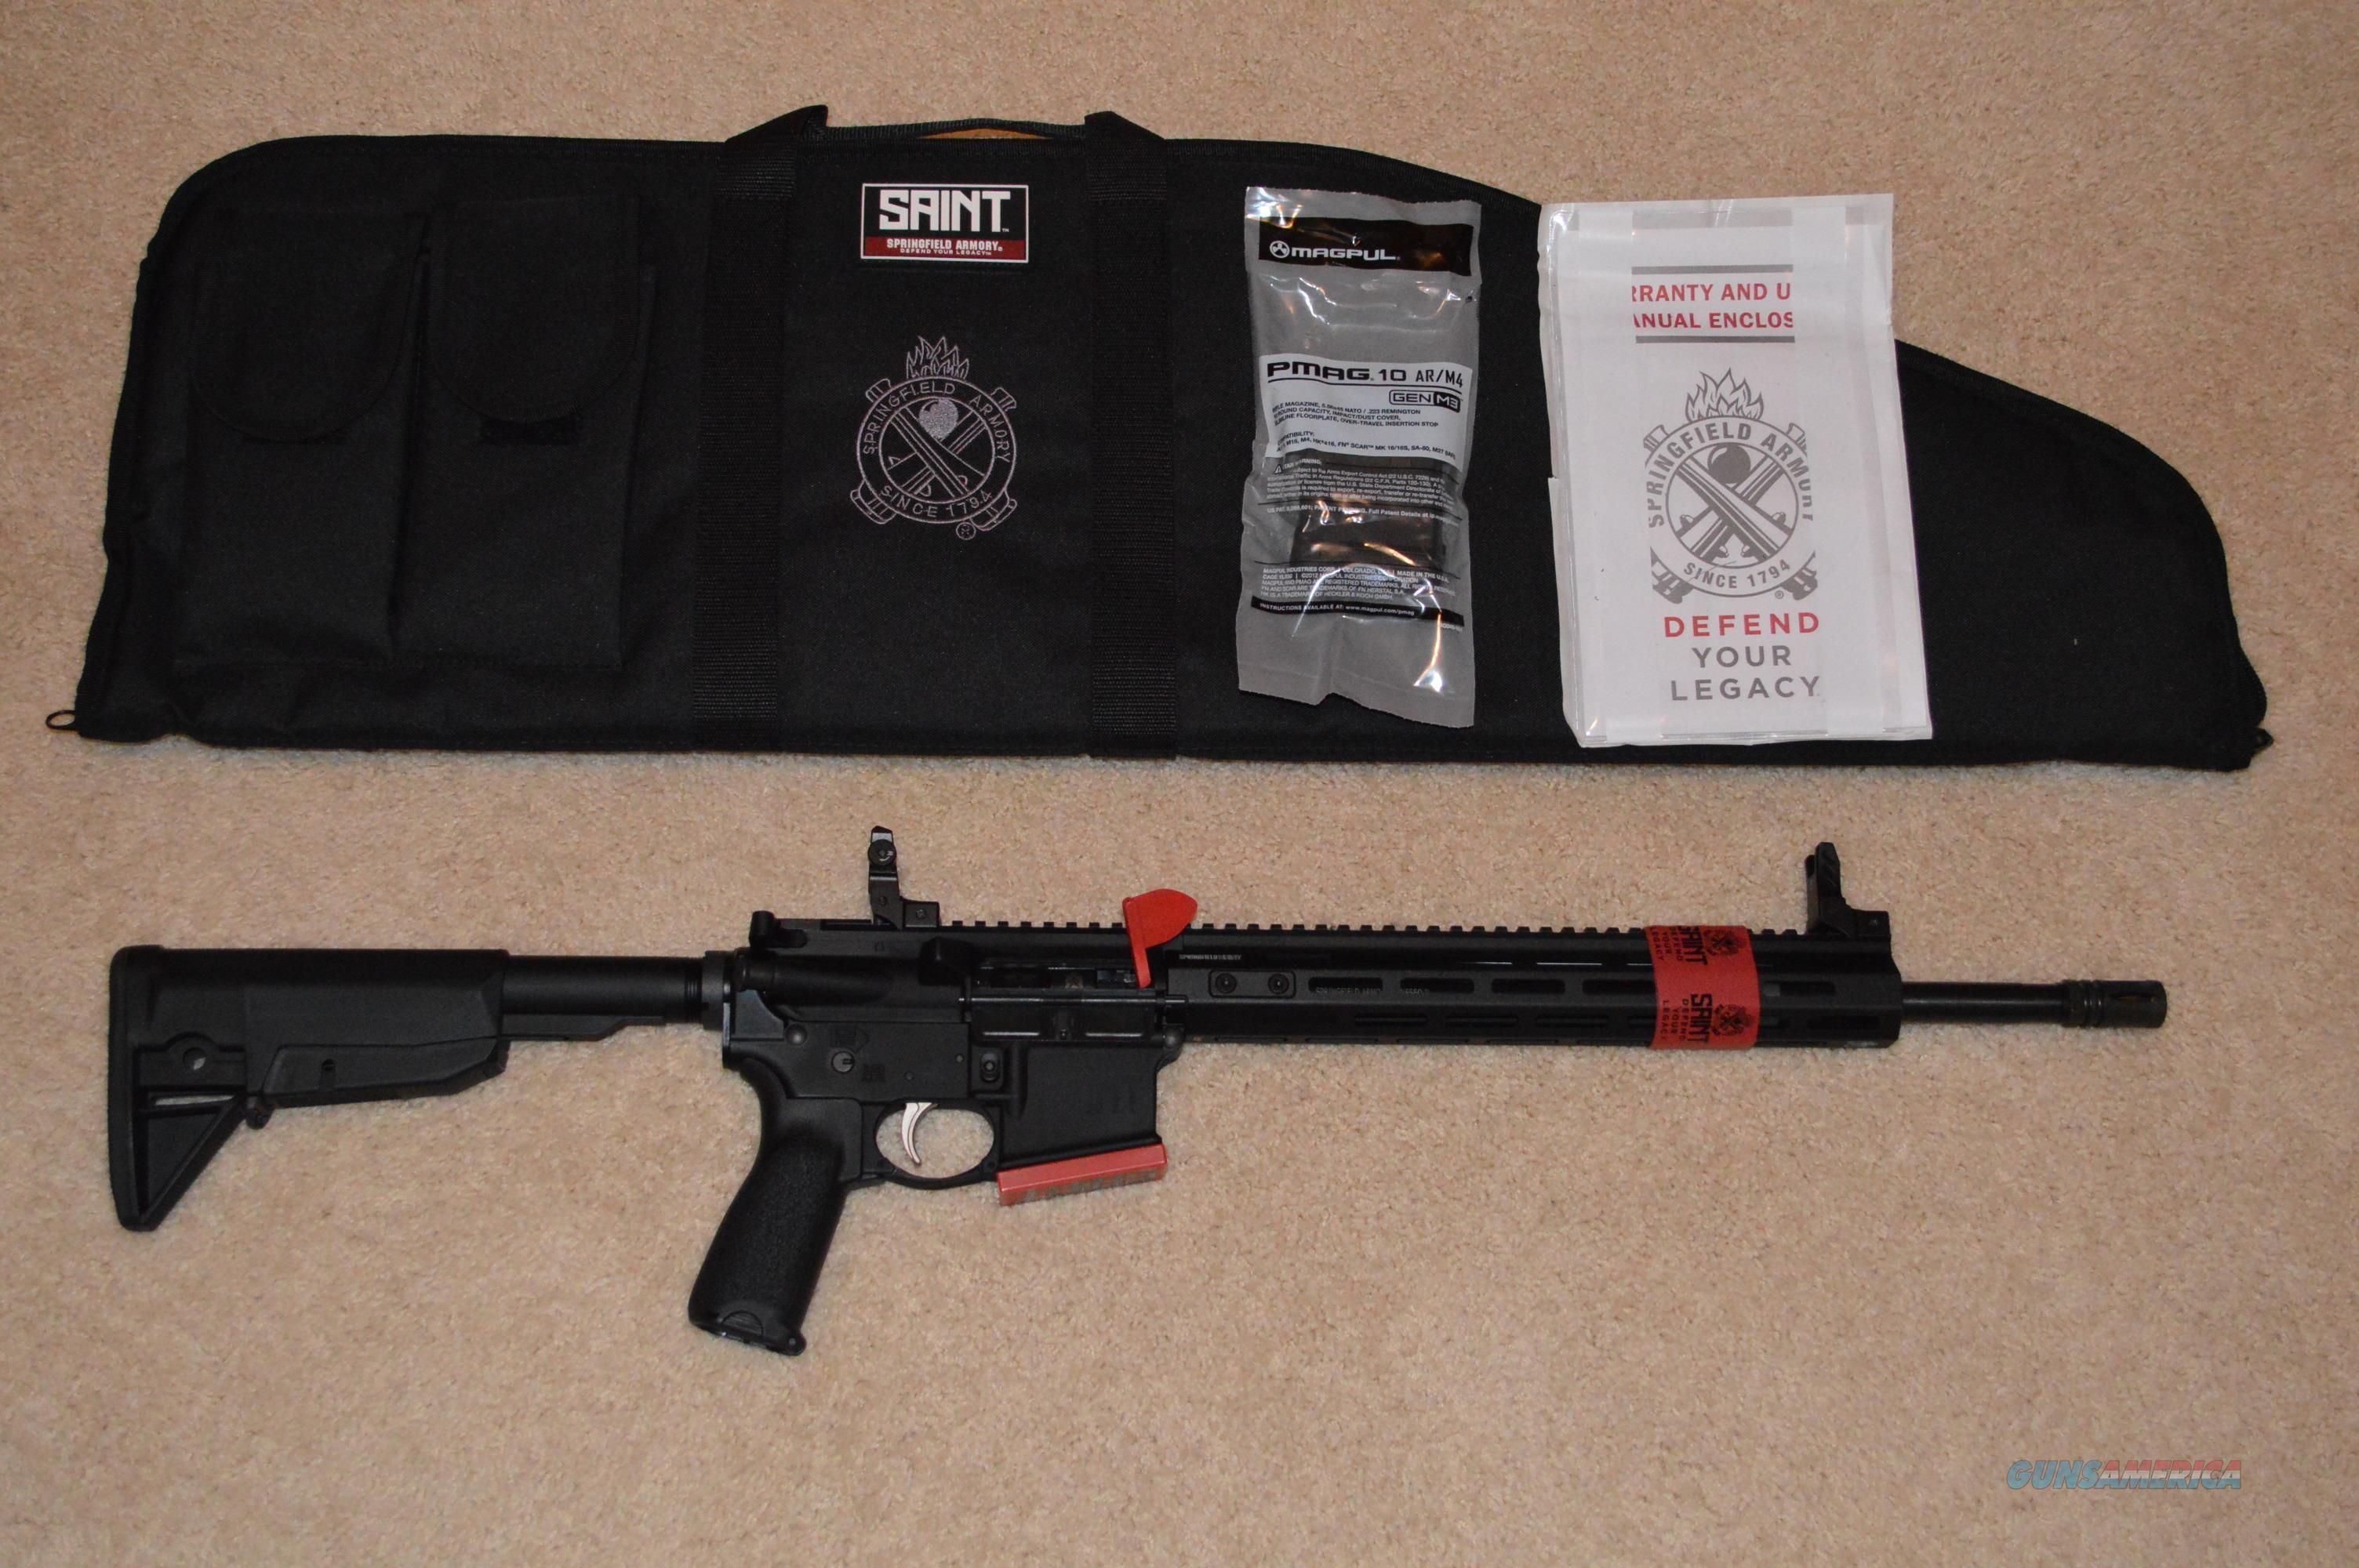 On Sale! Springfield Saint AR-15 (10 round compliant)